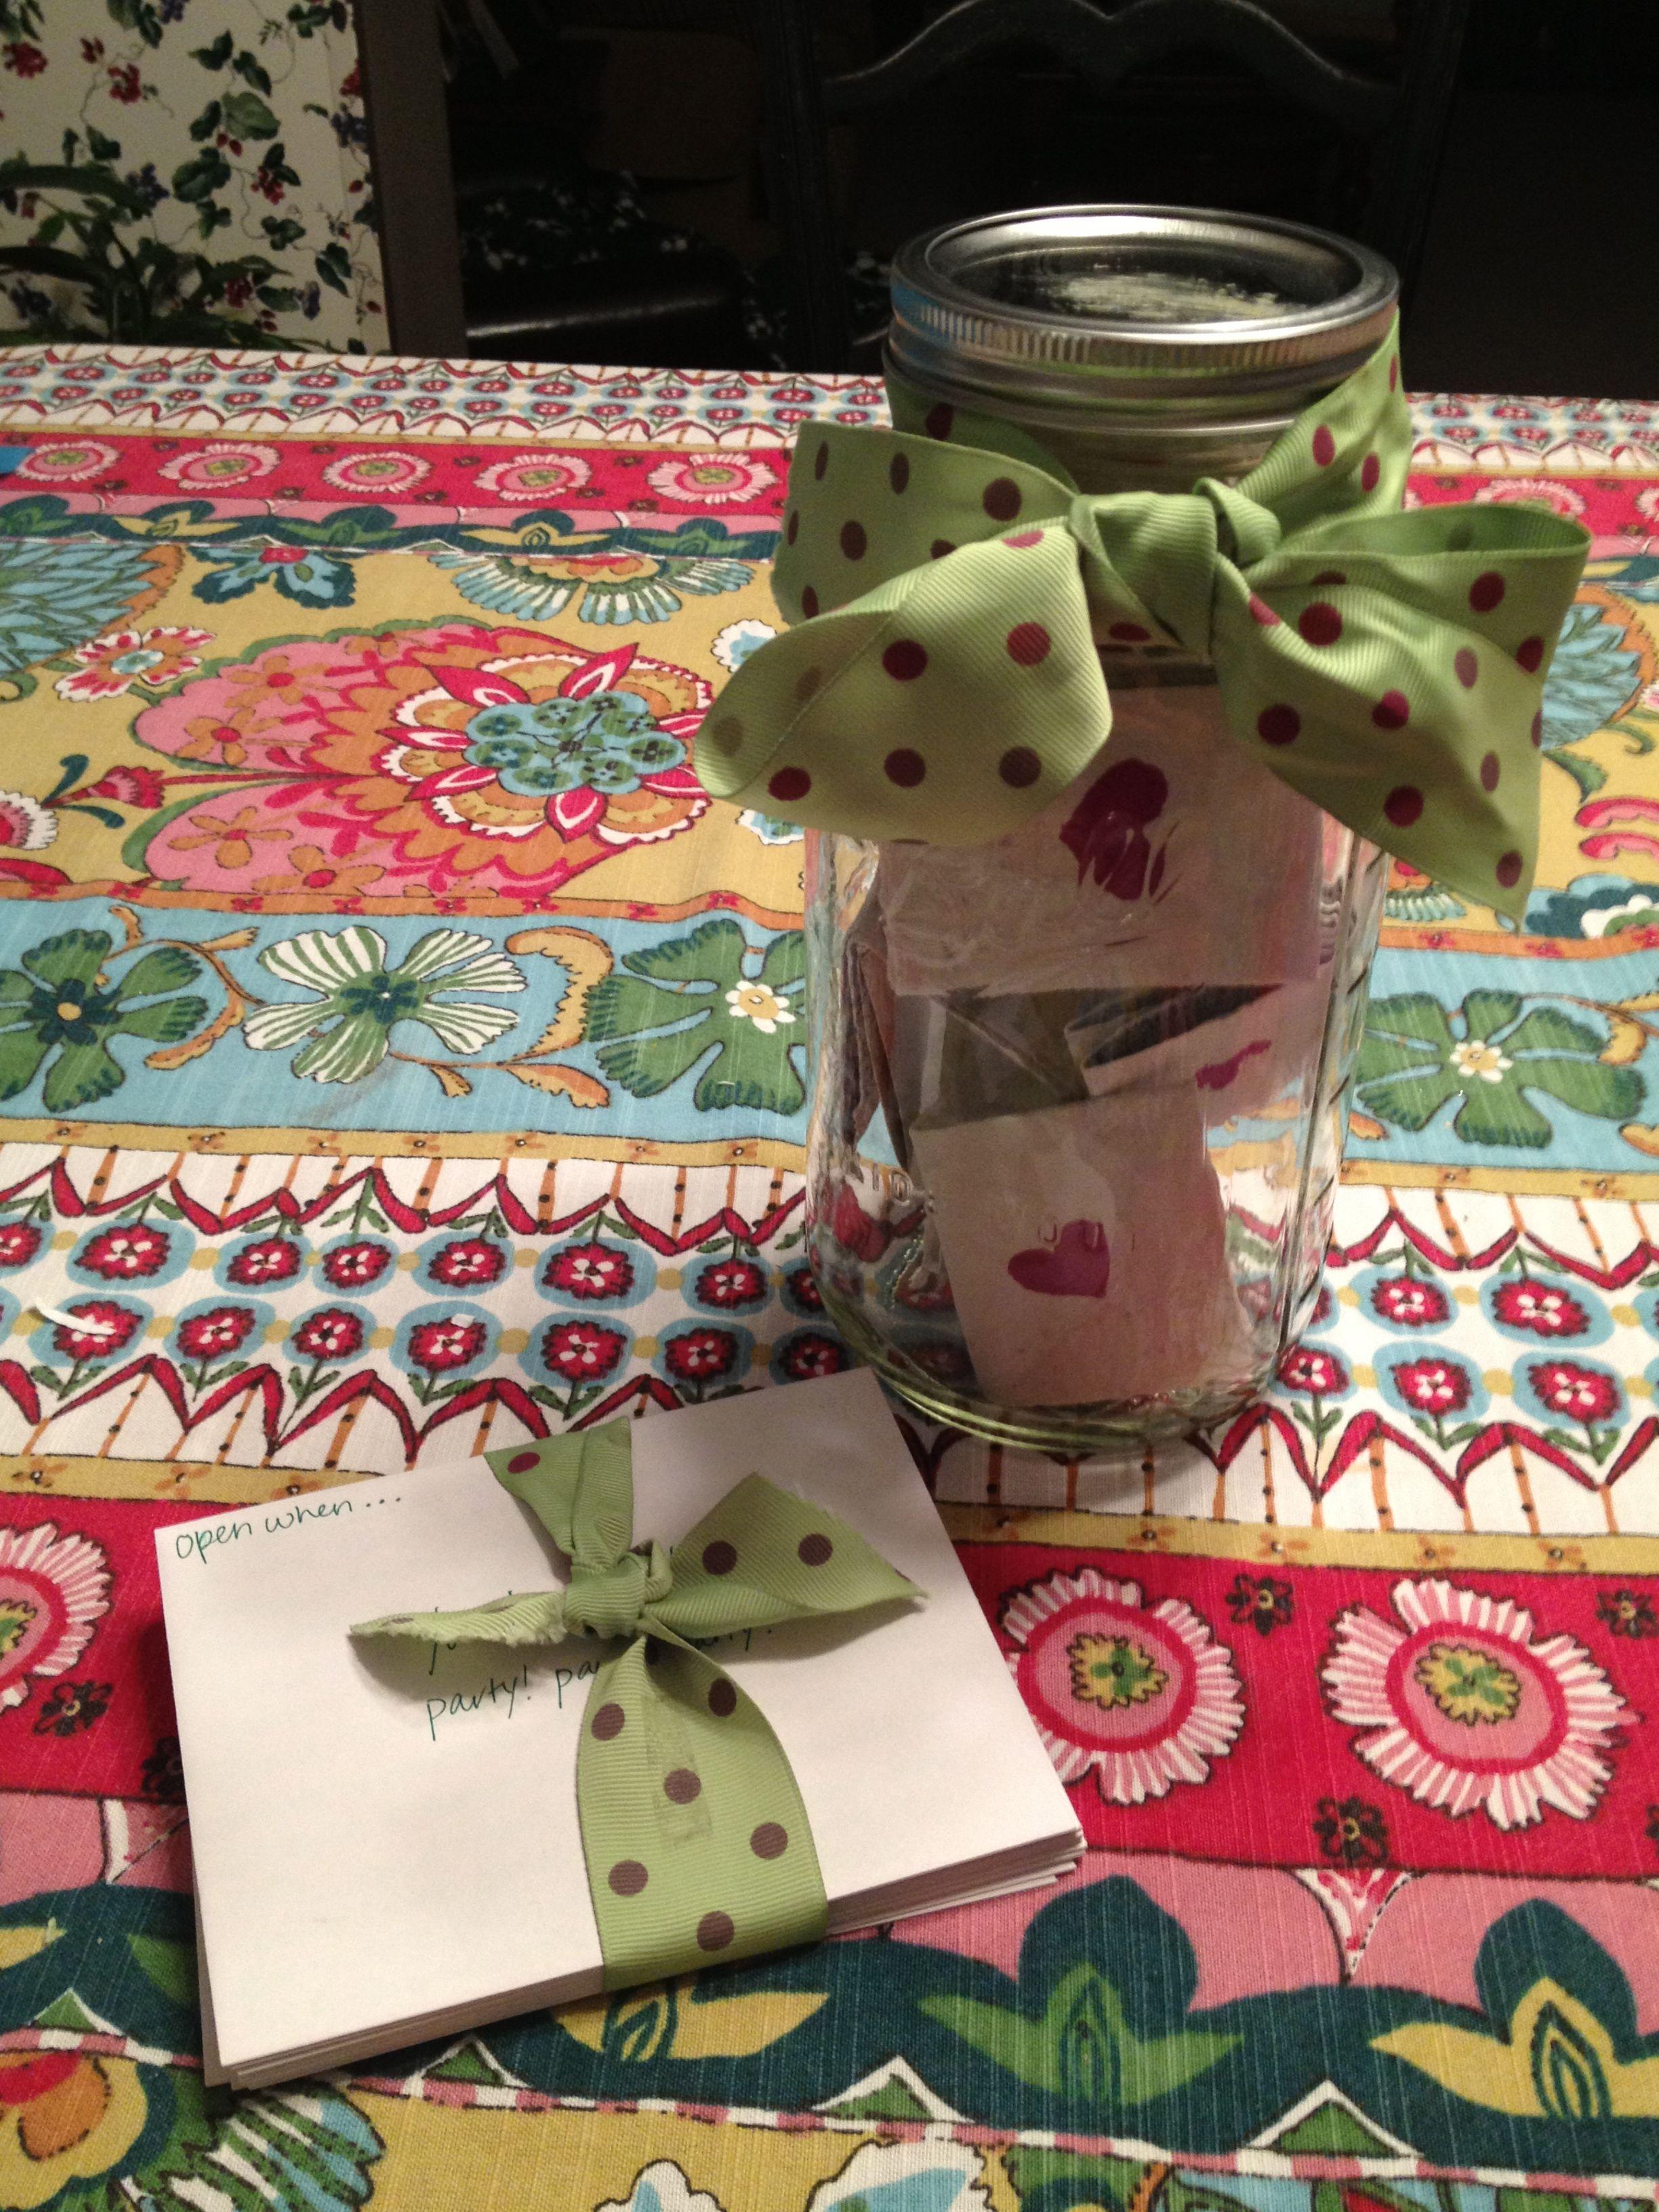 Birthday gift ideas for boyfriend in long distance